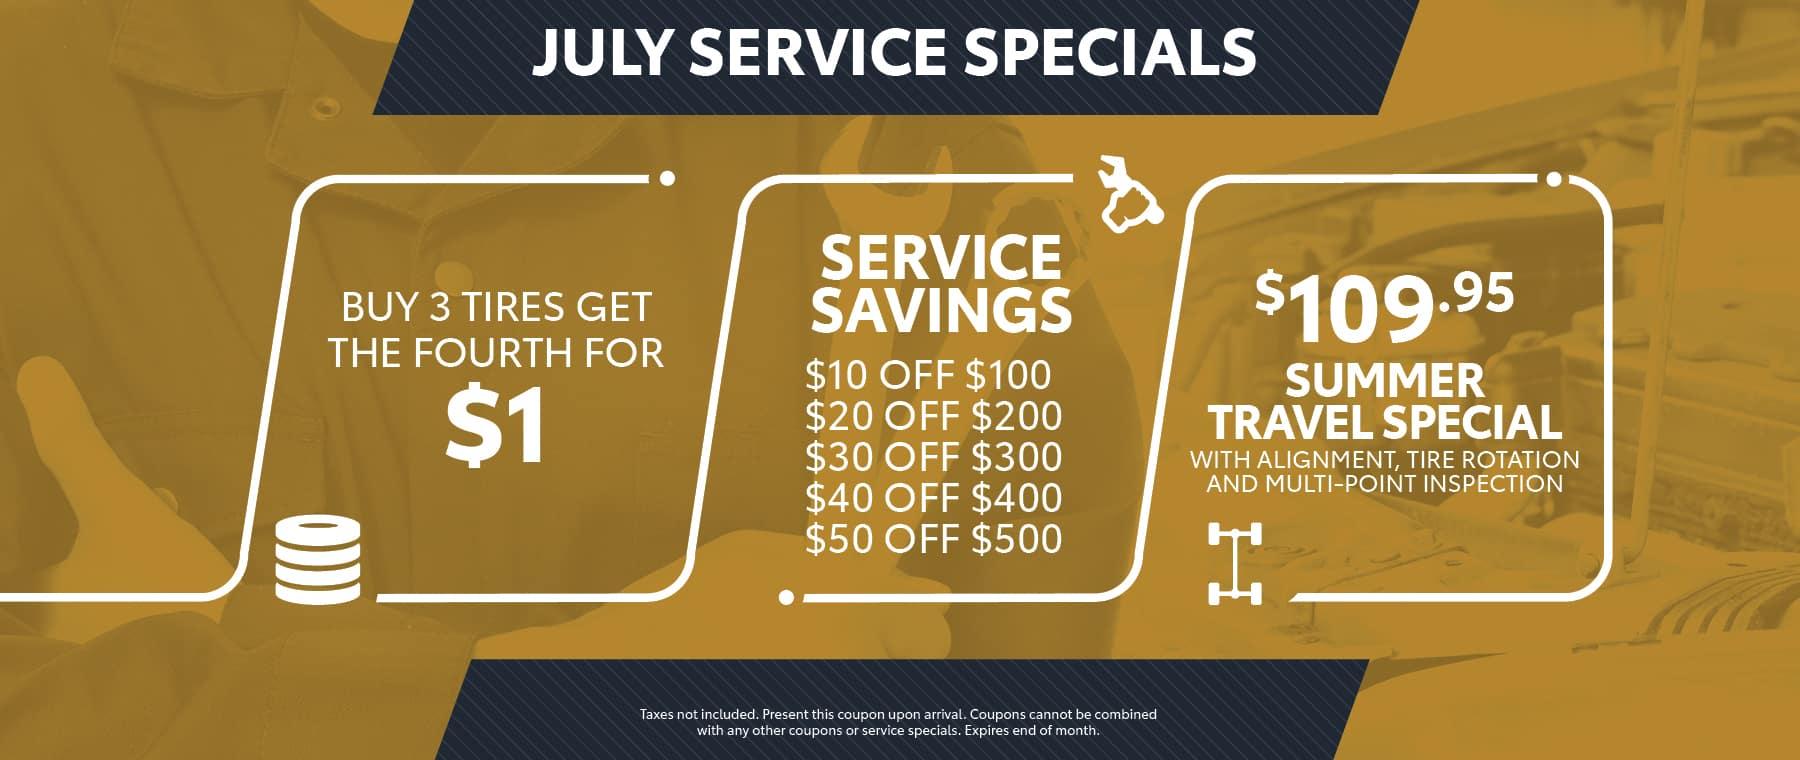 1710107-GWC – July Service Web Assets-1800×760